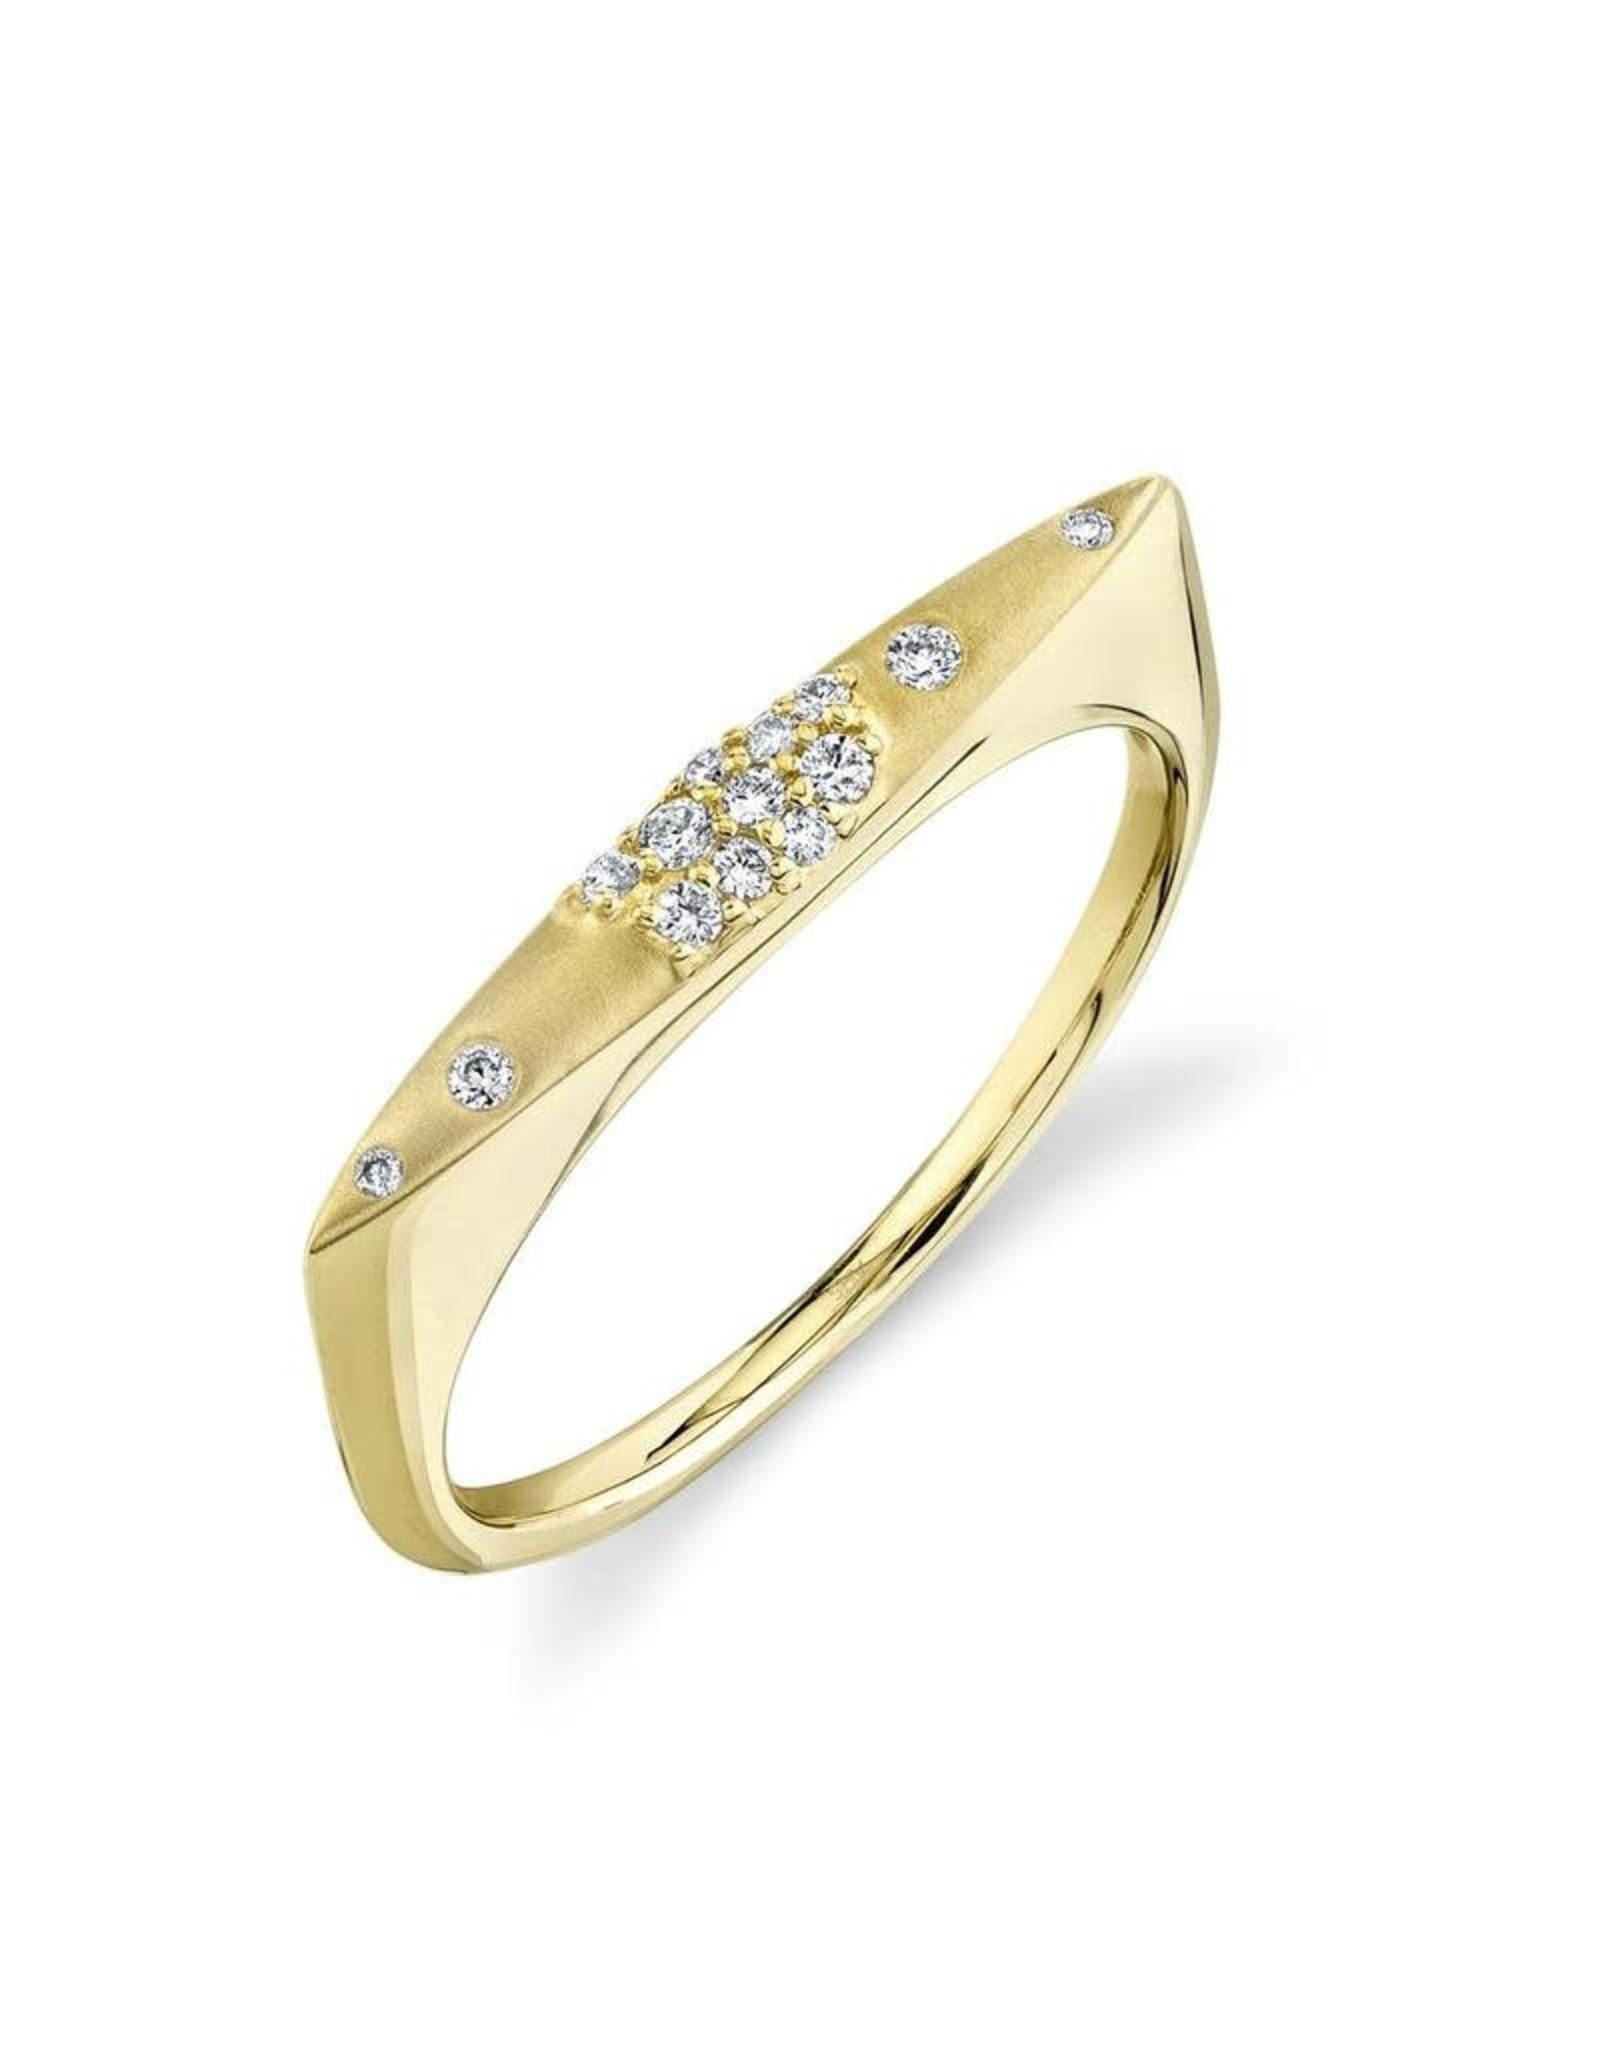 14K Yellow Gold Matte Finish Stackable Diamond Bar Ring, D: 0.09ct